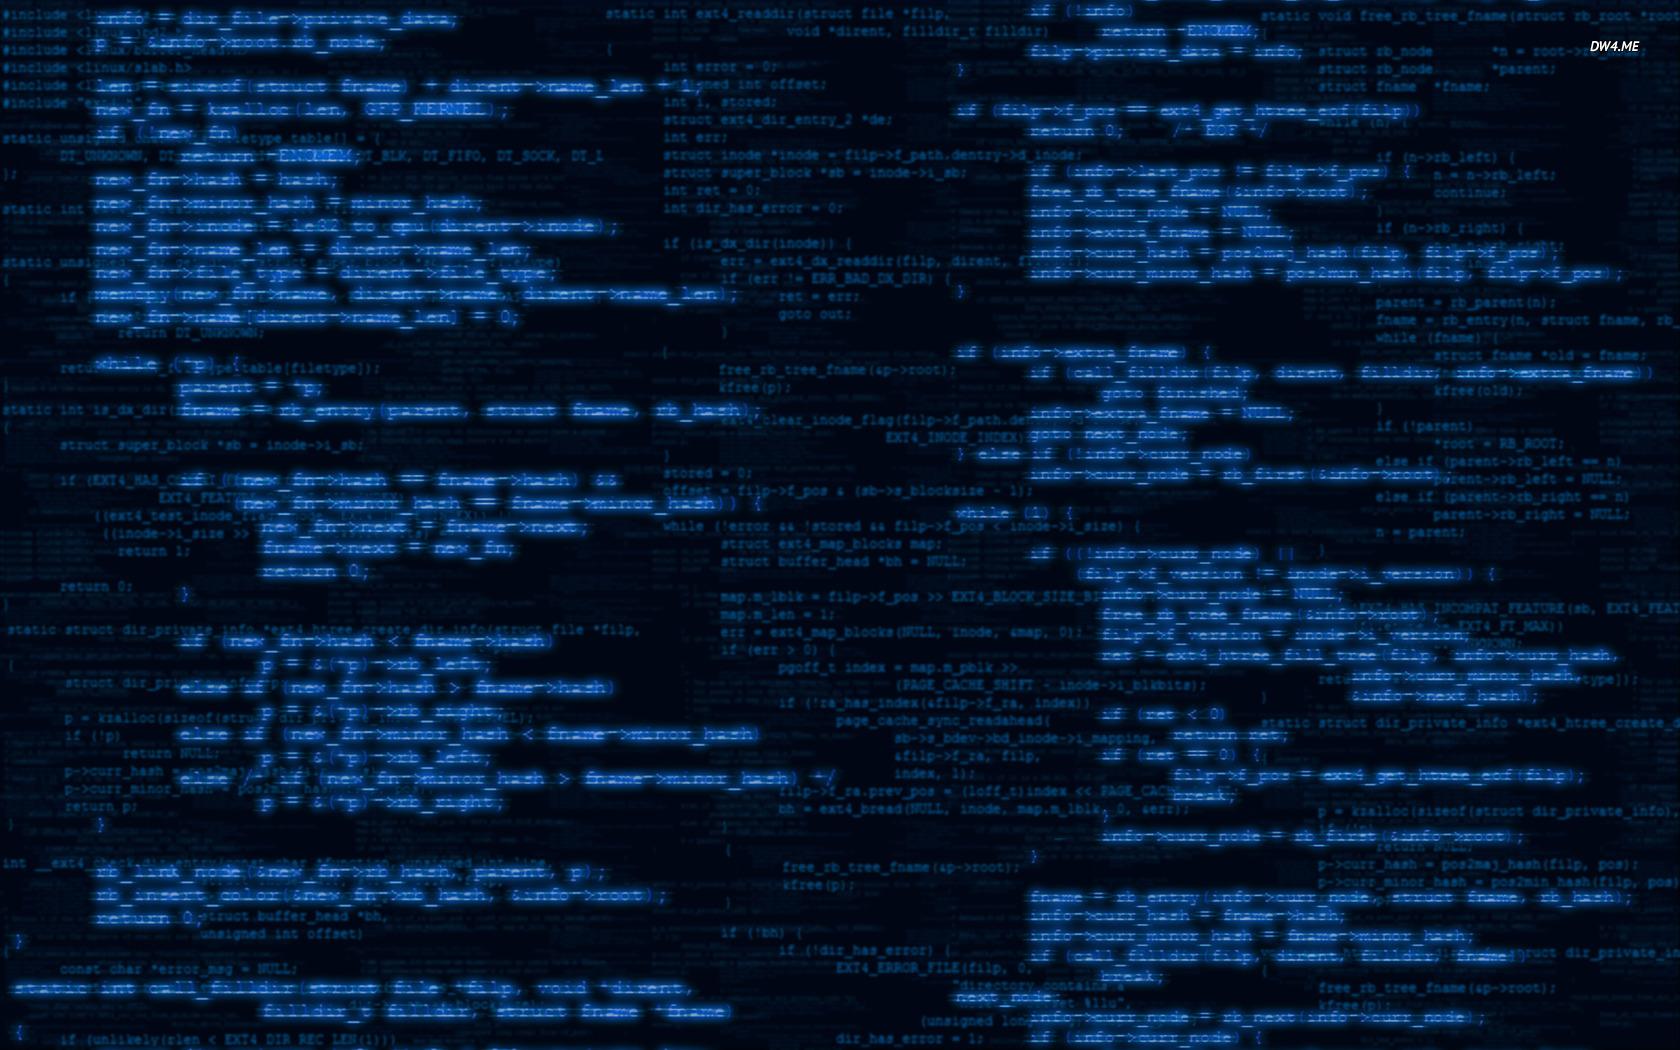 code wallpaper 1920x1080 Source code wallpaper 1920x1200 Source code 1680x1050